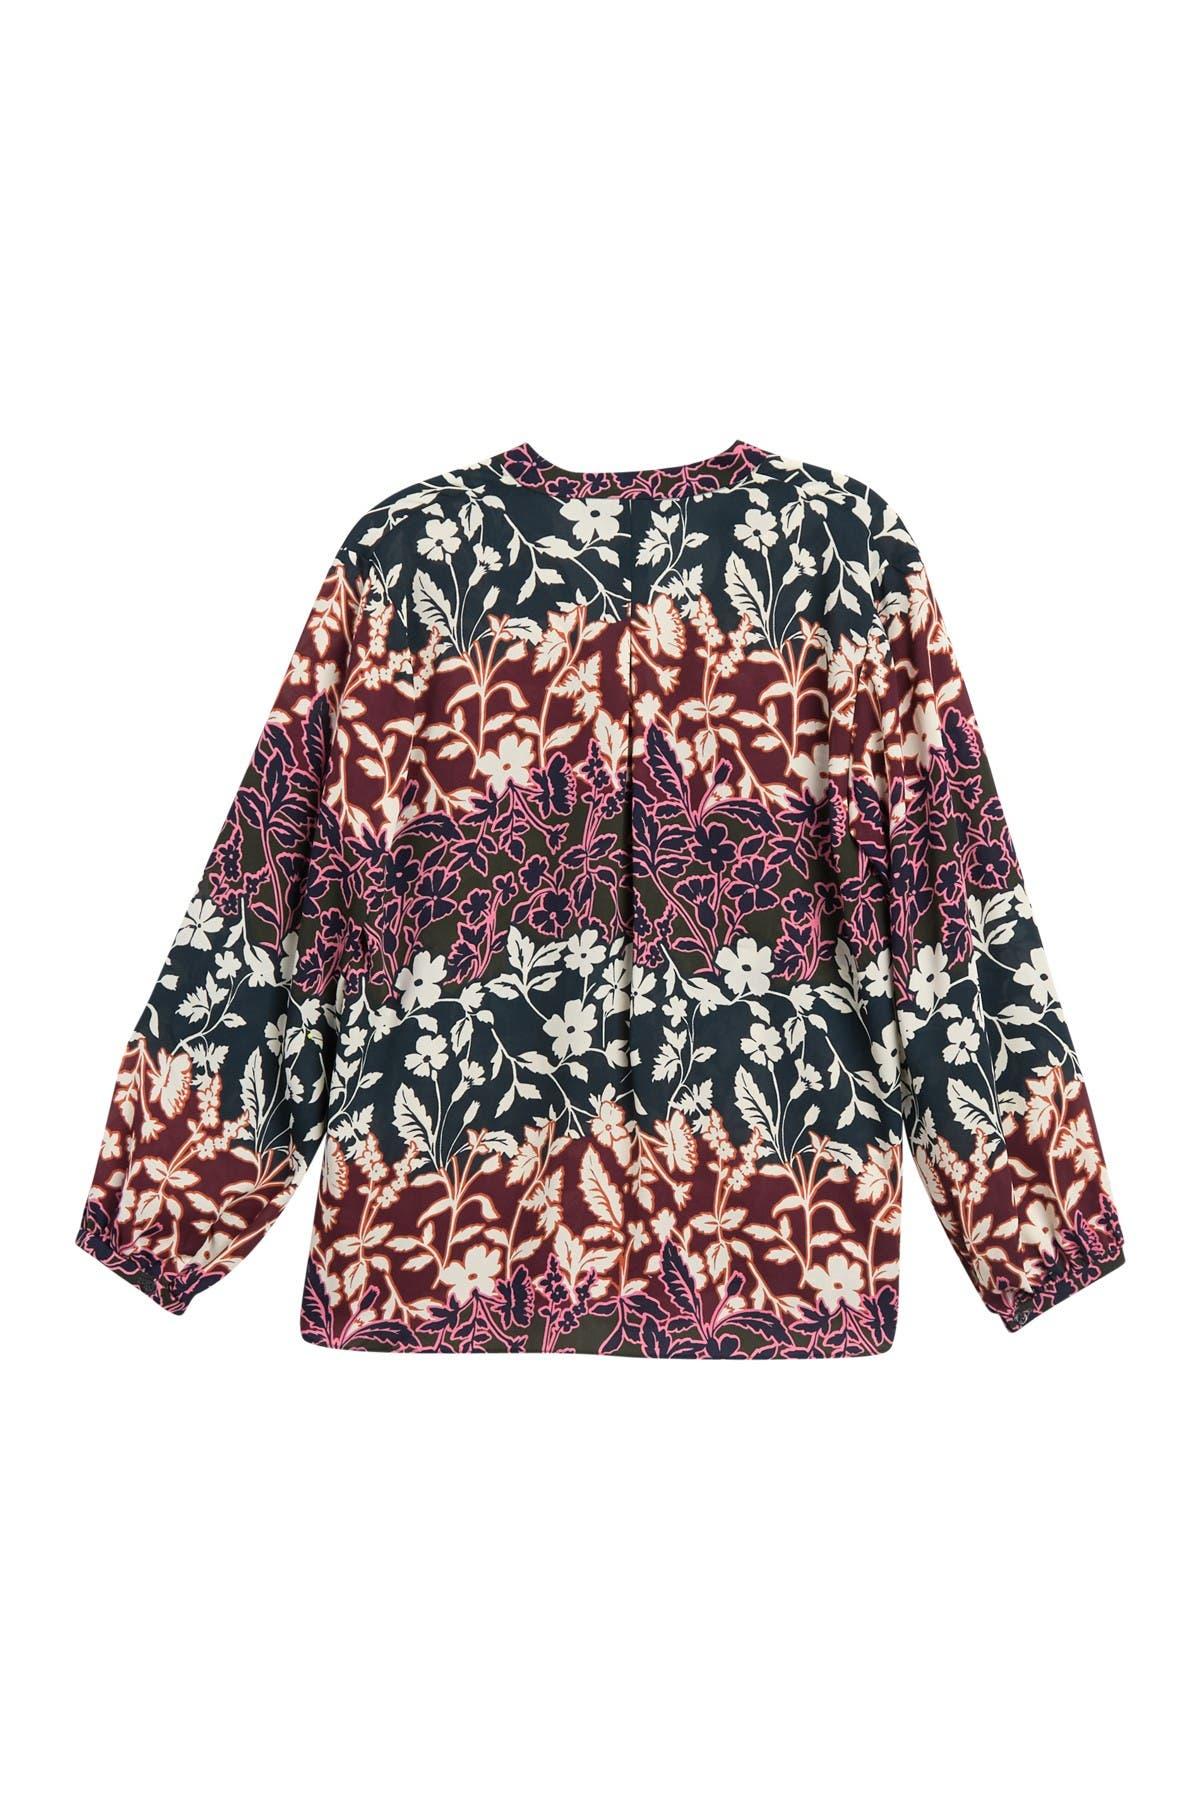 Image of Rachel Rachel Roy Elle Floral Long Sleeve Blouse